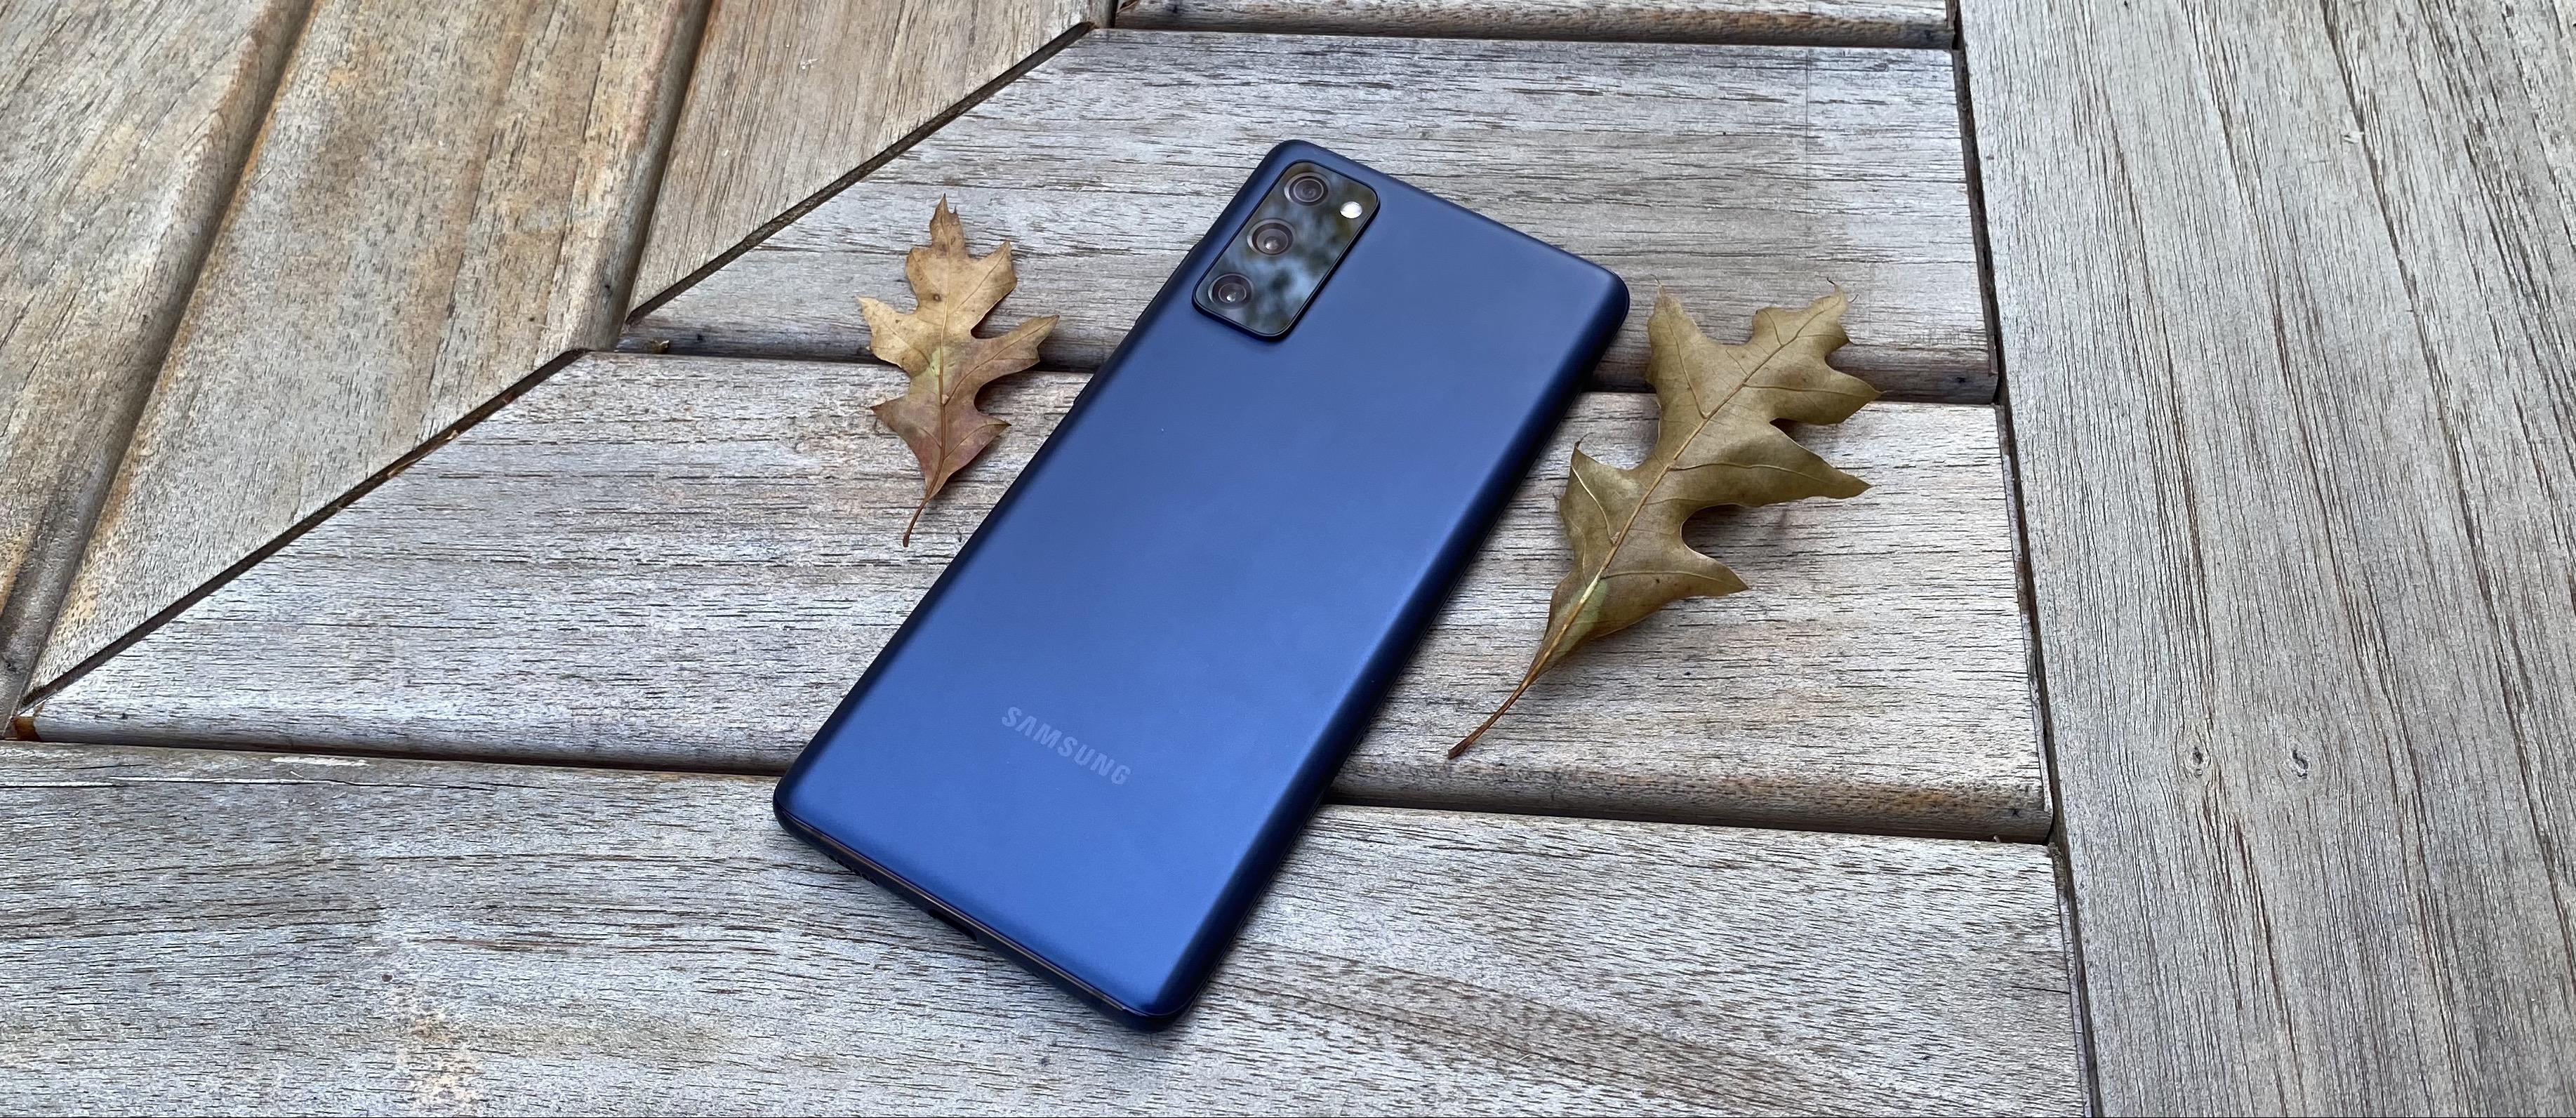 Samsung Galaxy S21 vs. Galaxy S20 FE: Koji telefon biste trebali kupiti?